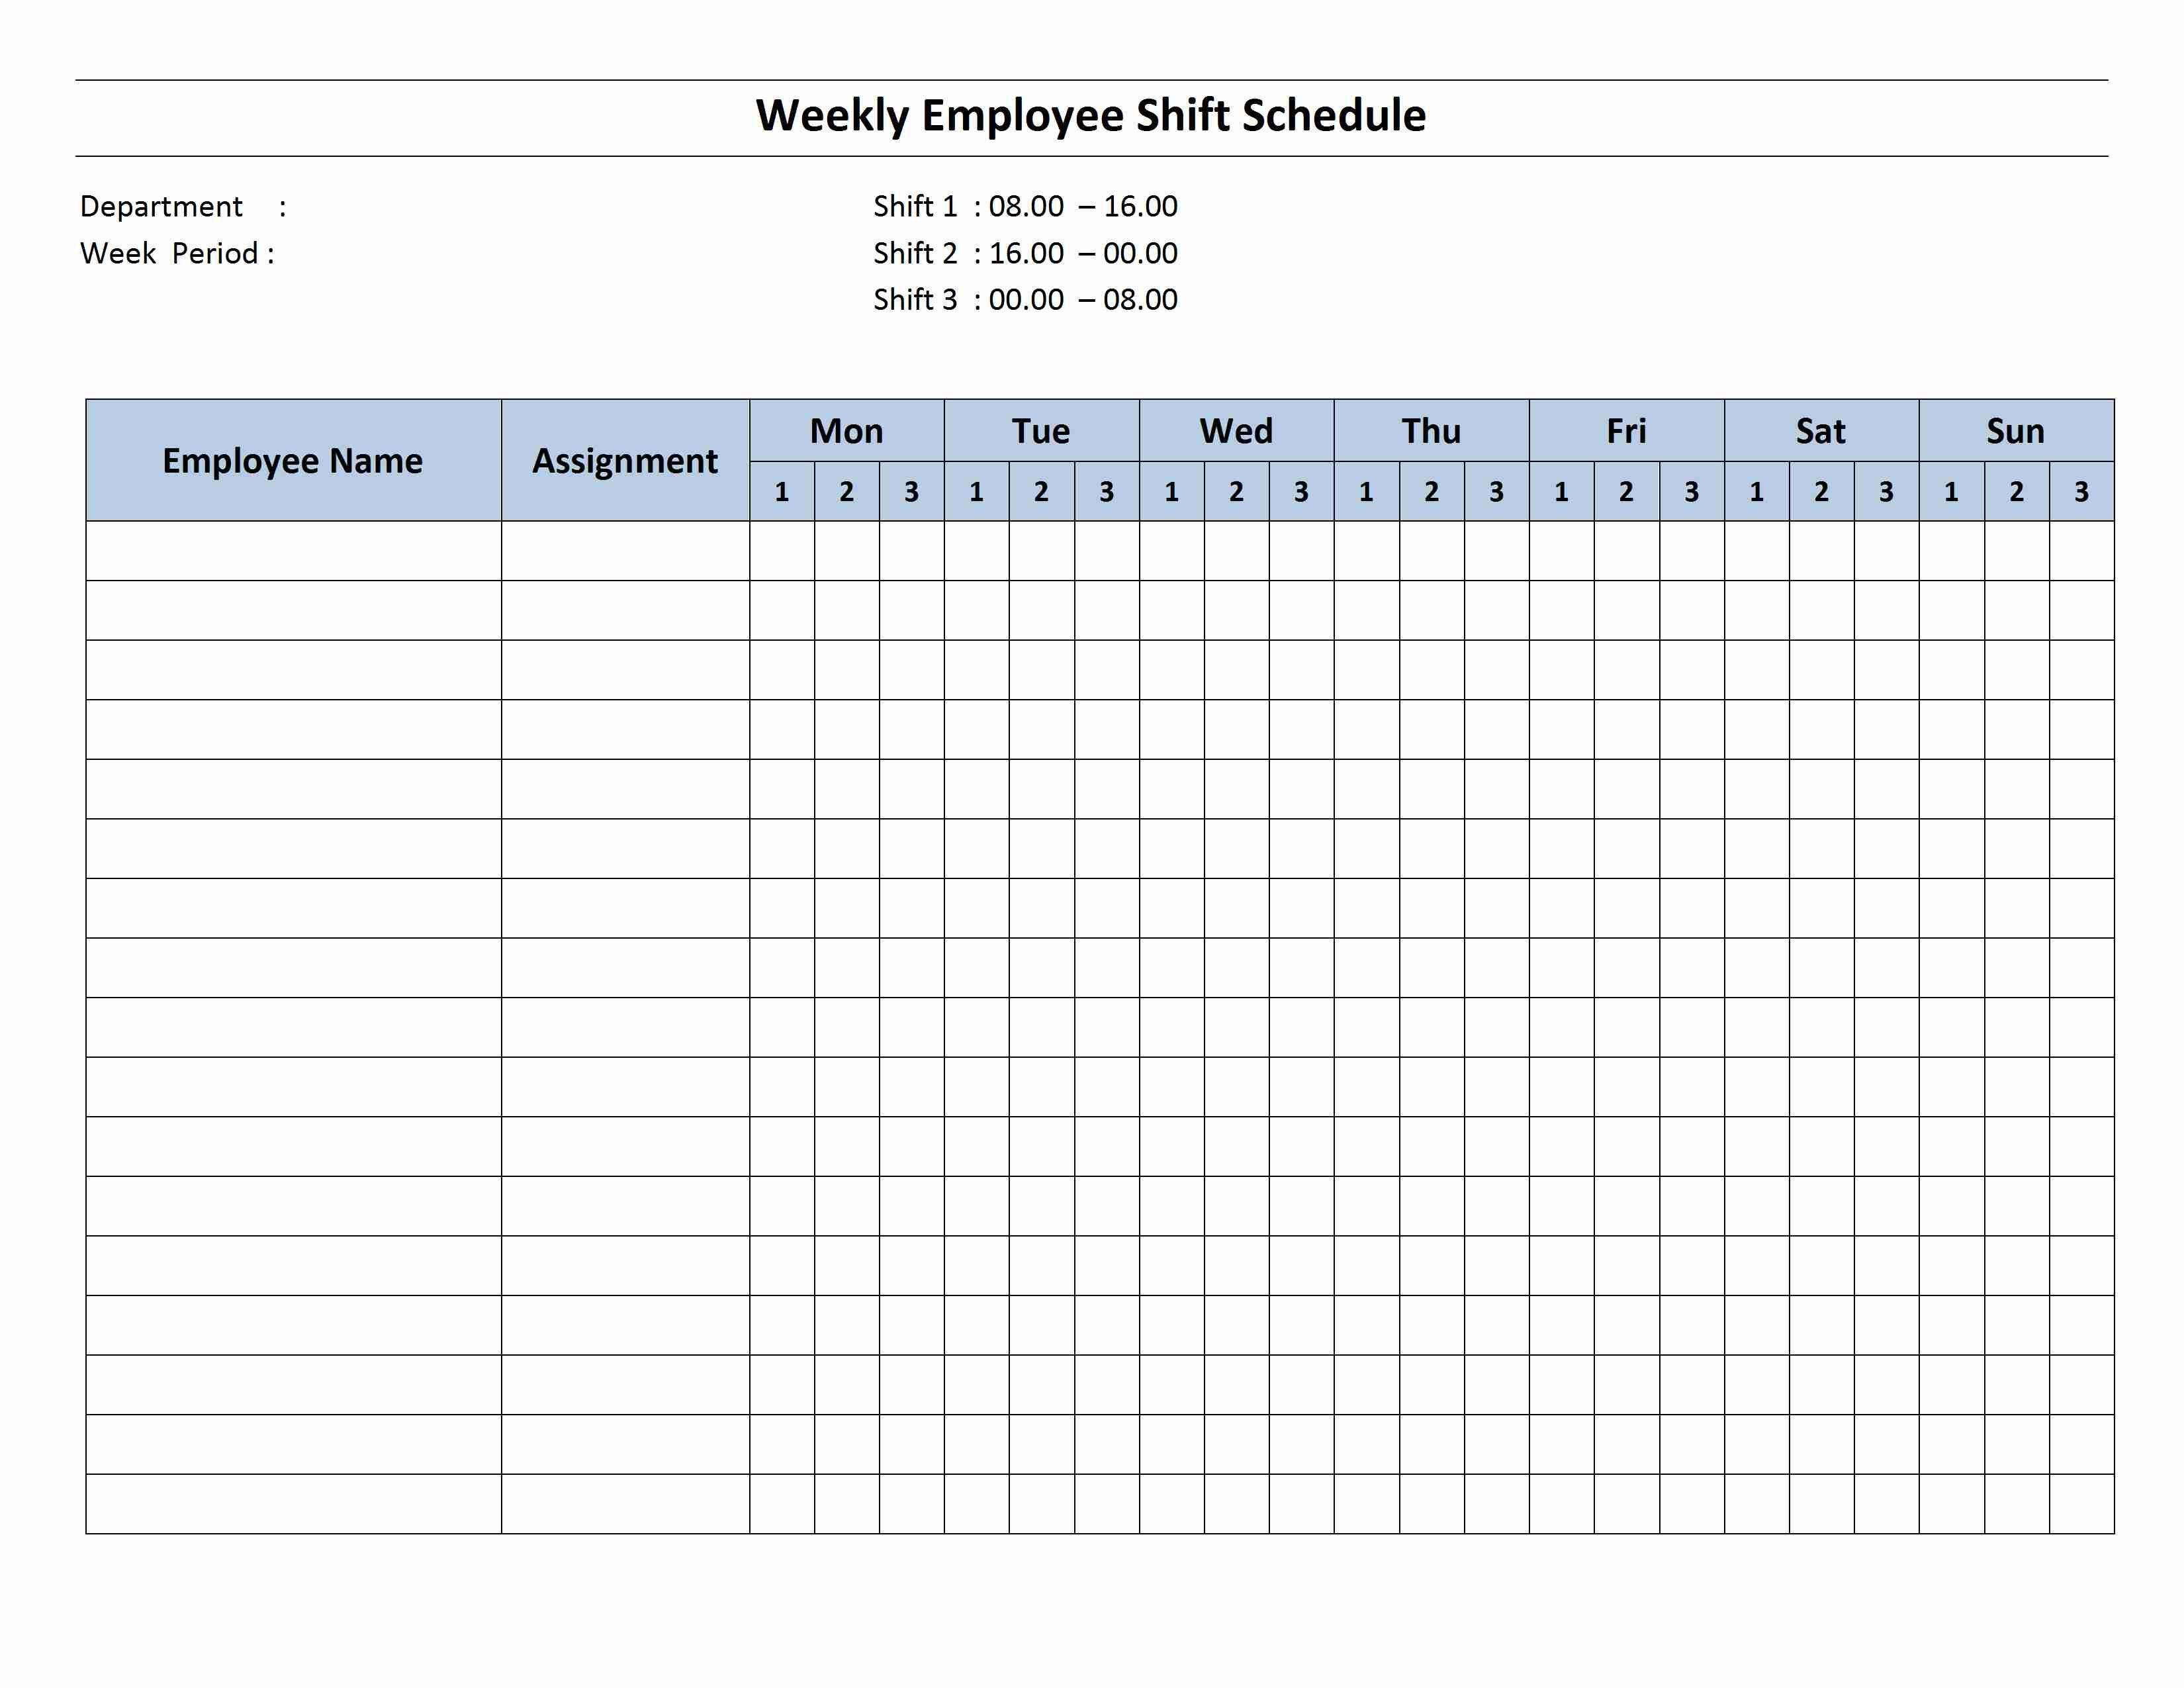 Free Monthly Work Schedule Template | Weekly Employee 8 Hour Shift - Free Printable Weekly Work Schedule